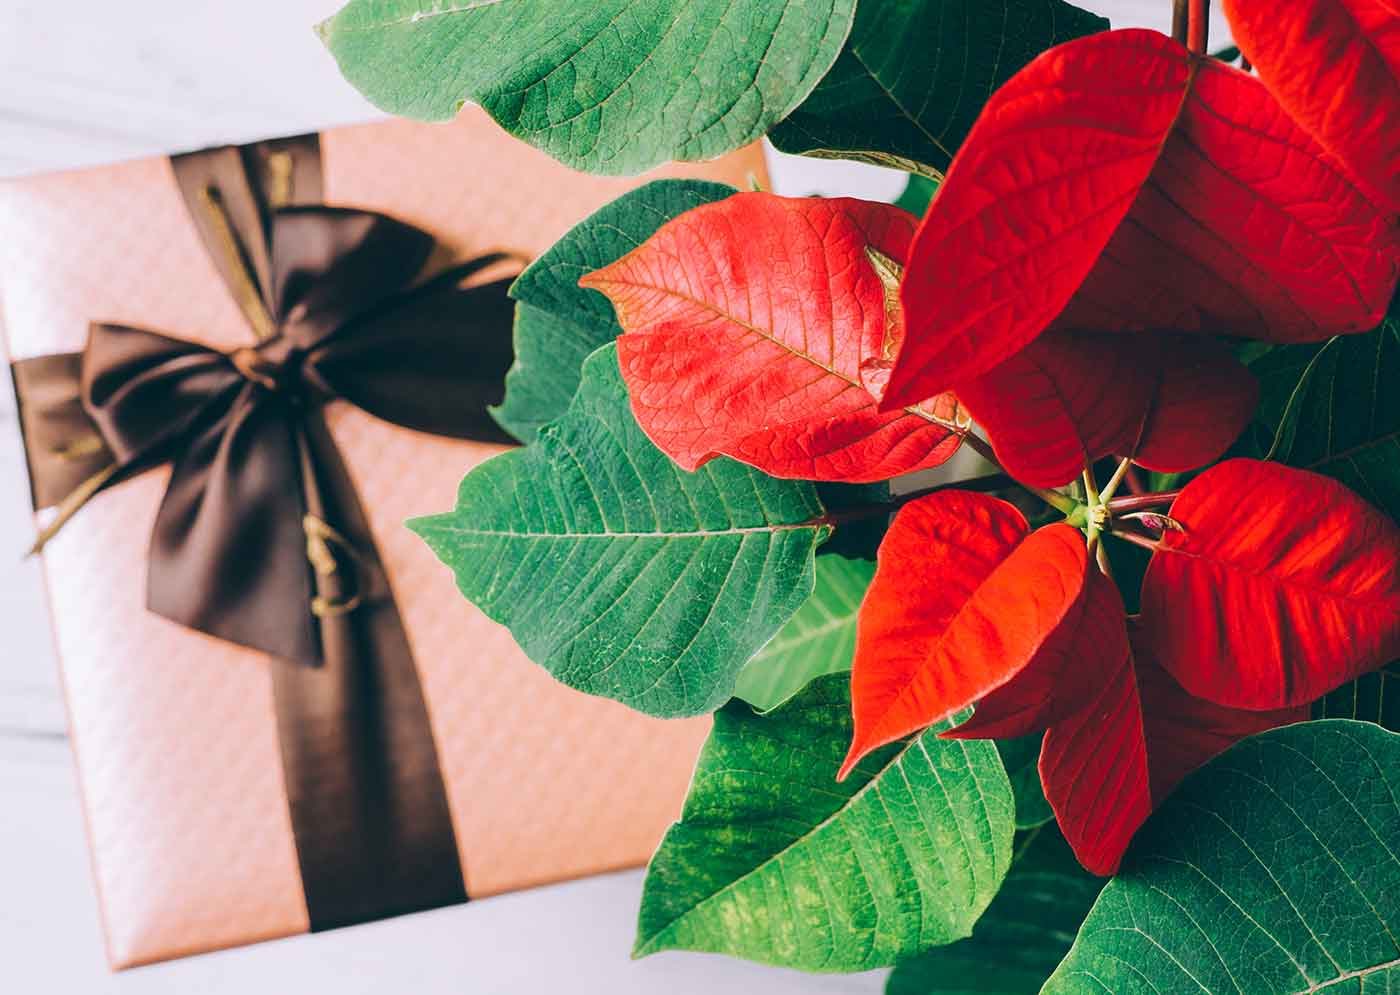 Flor de Pascua típica de Navidad